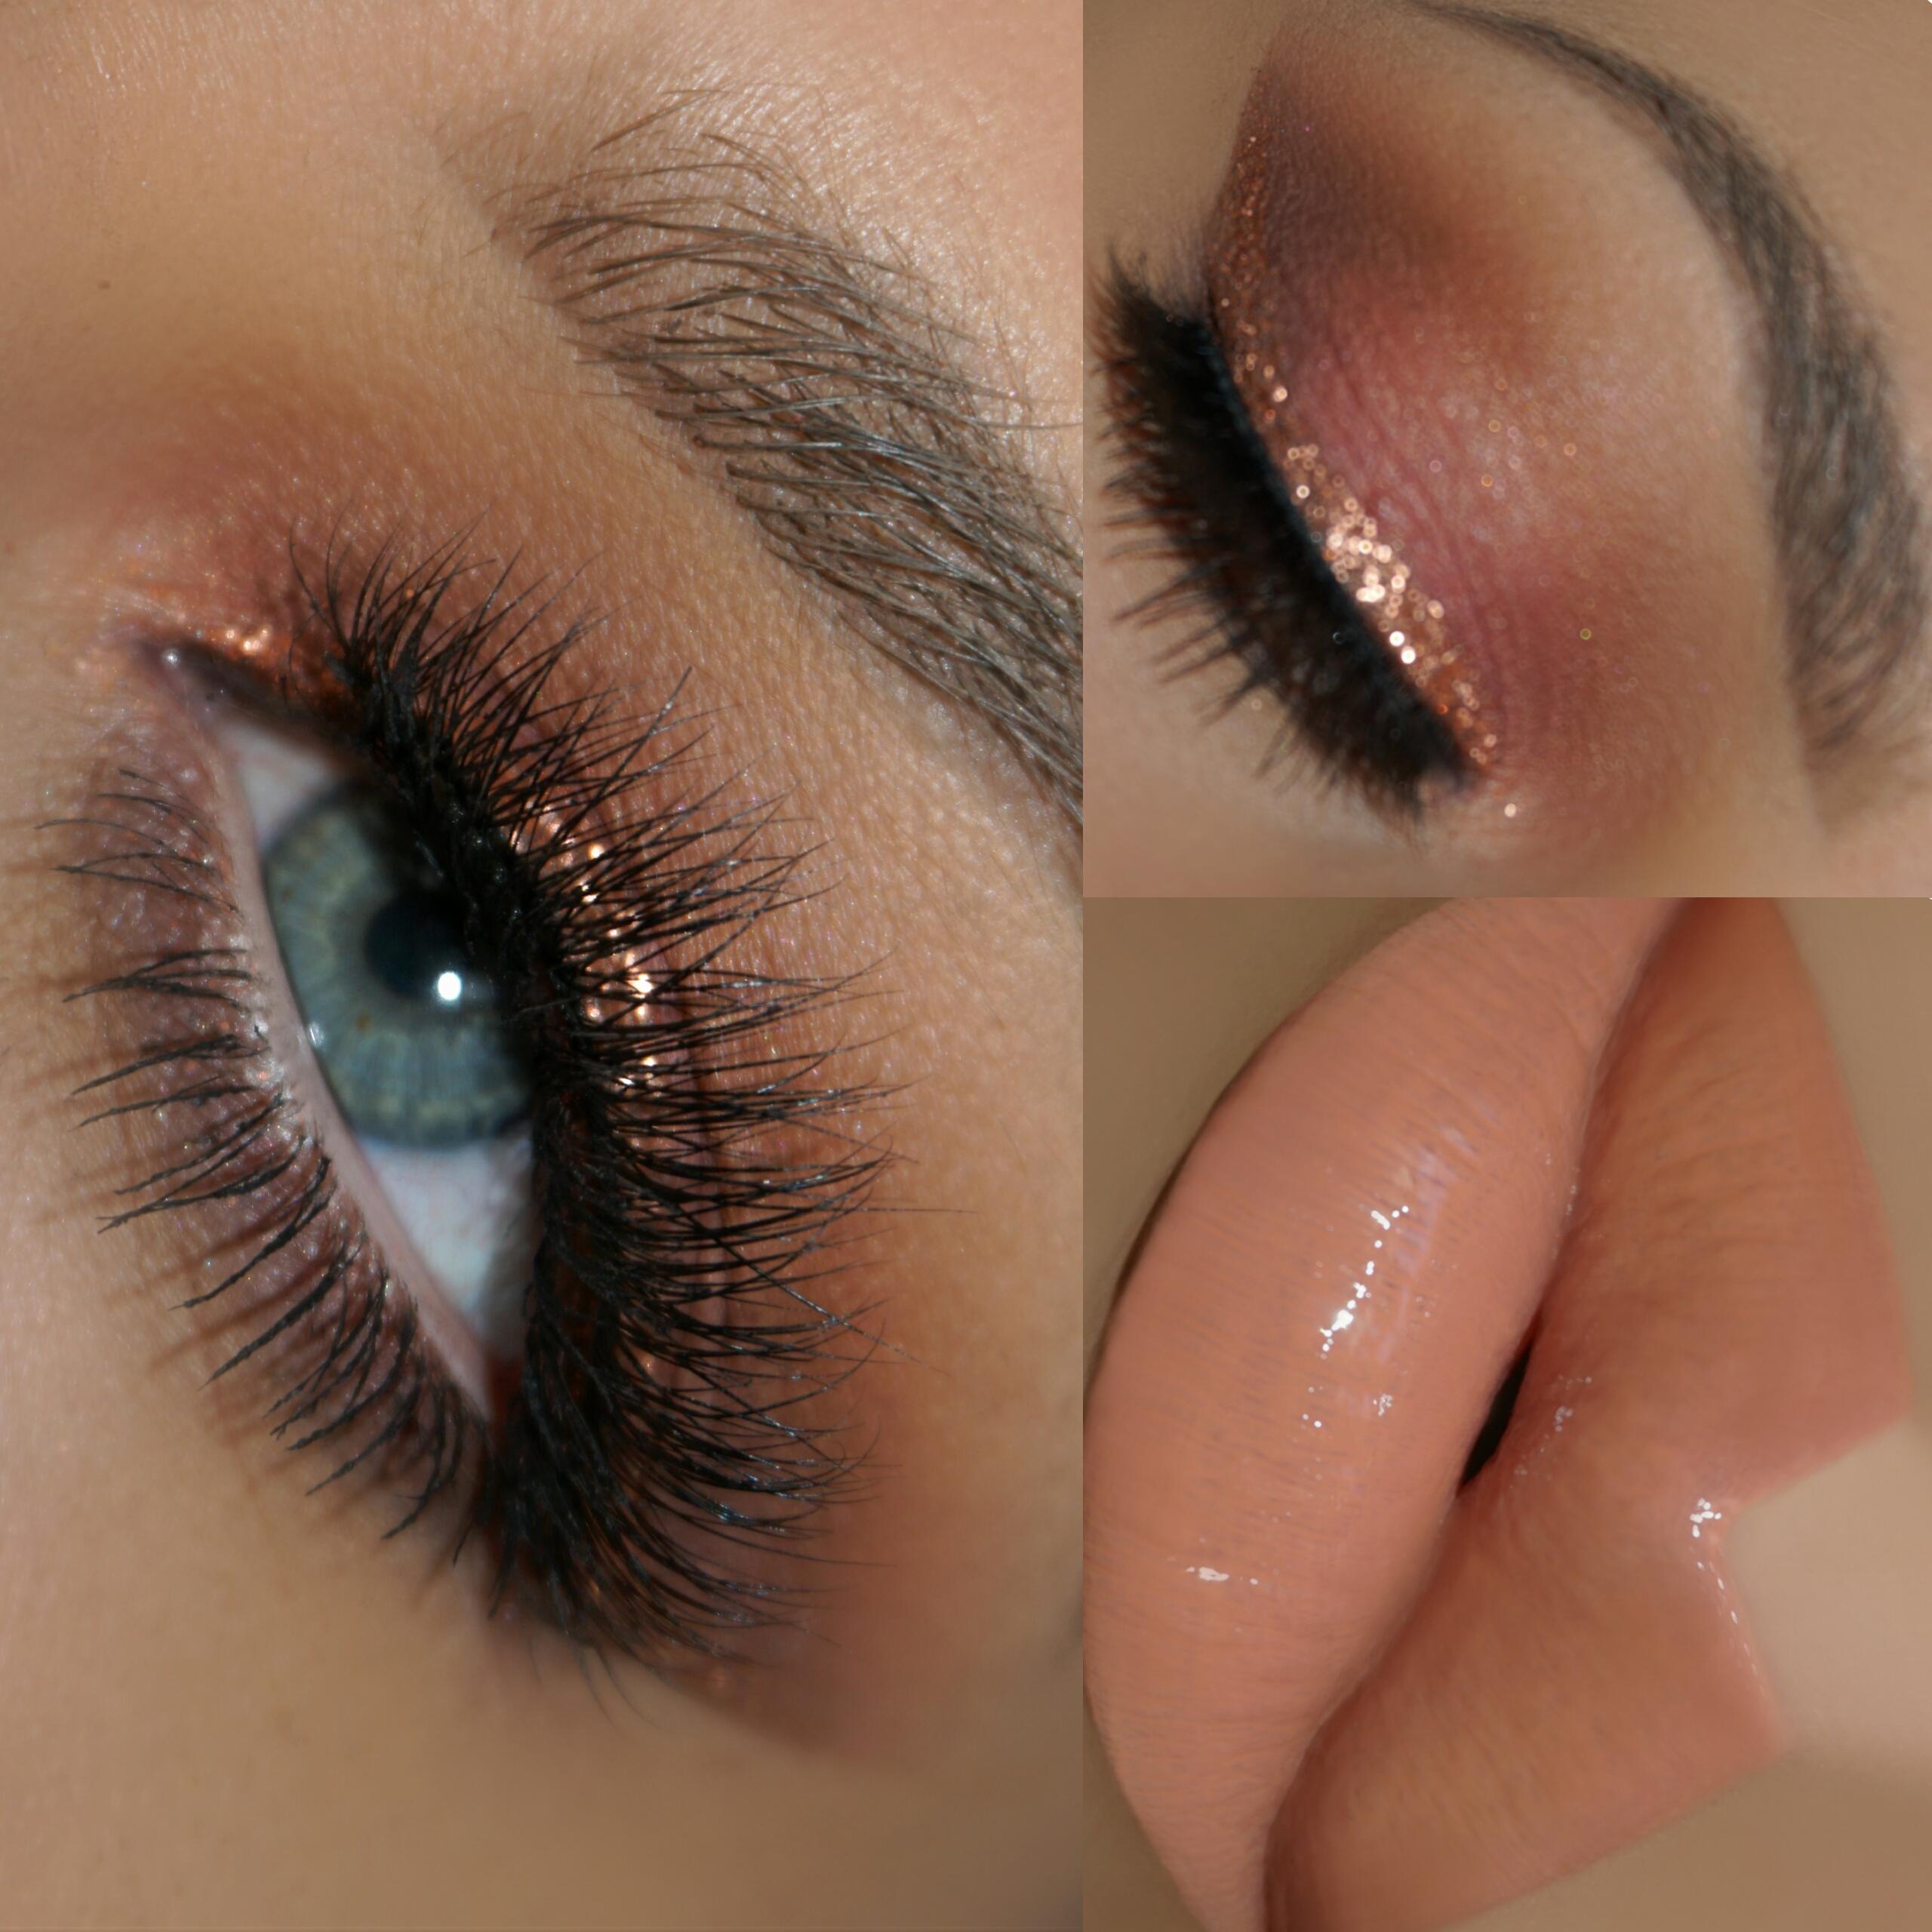 Lorens world lorens world latest beauty trends lifestyle motives rose gold eye shadow tutorial baditri Images